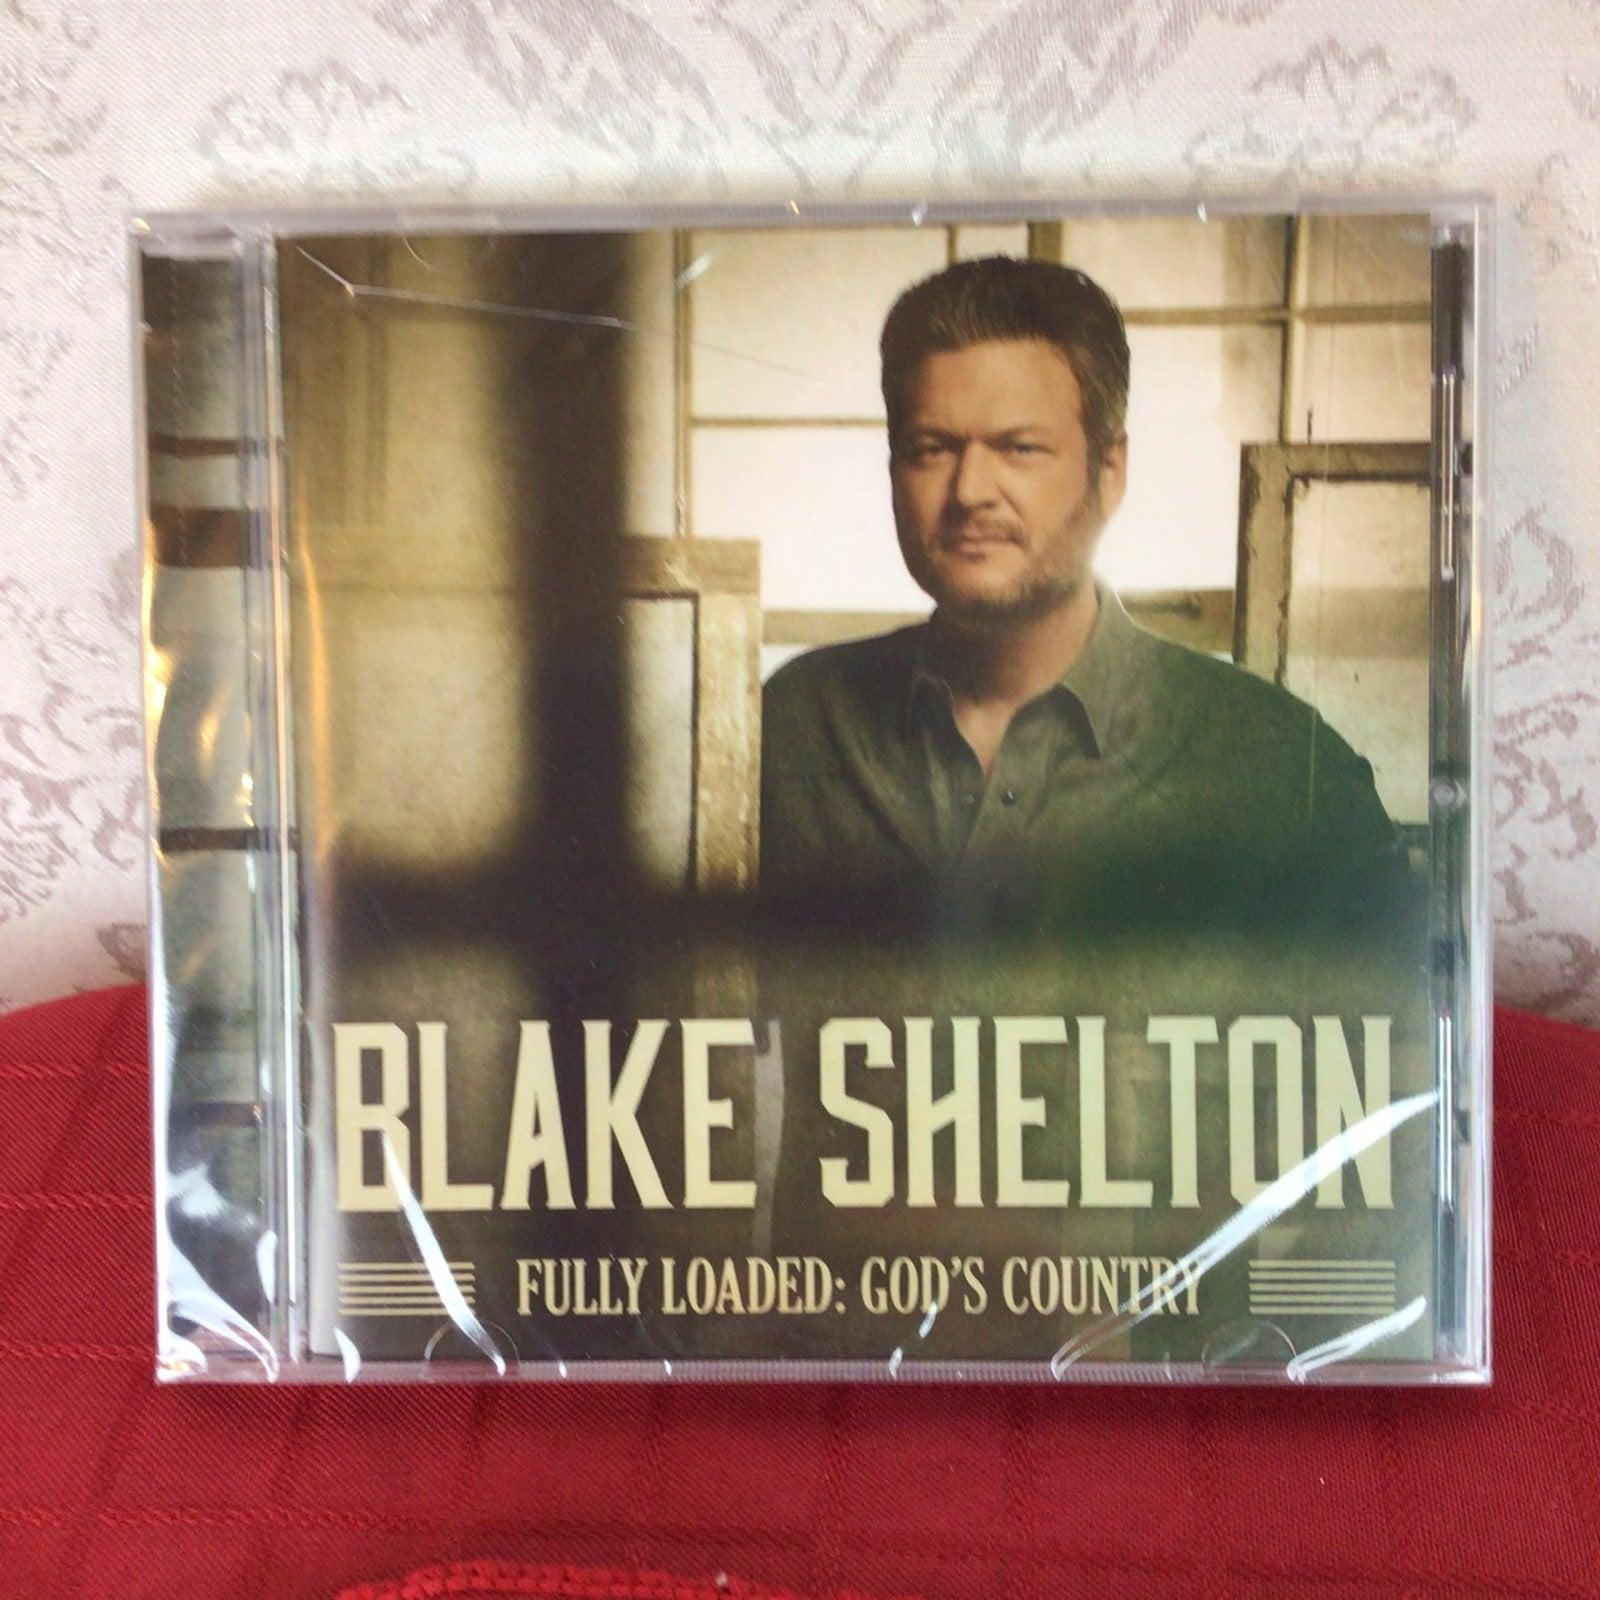 Blake Shelton Fully Loaded God's Country